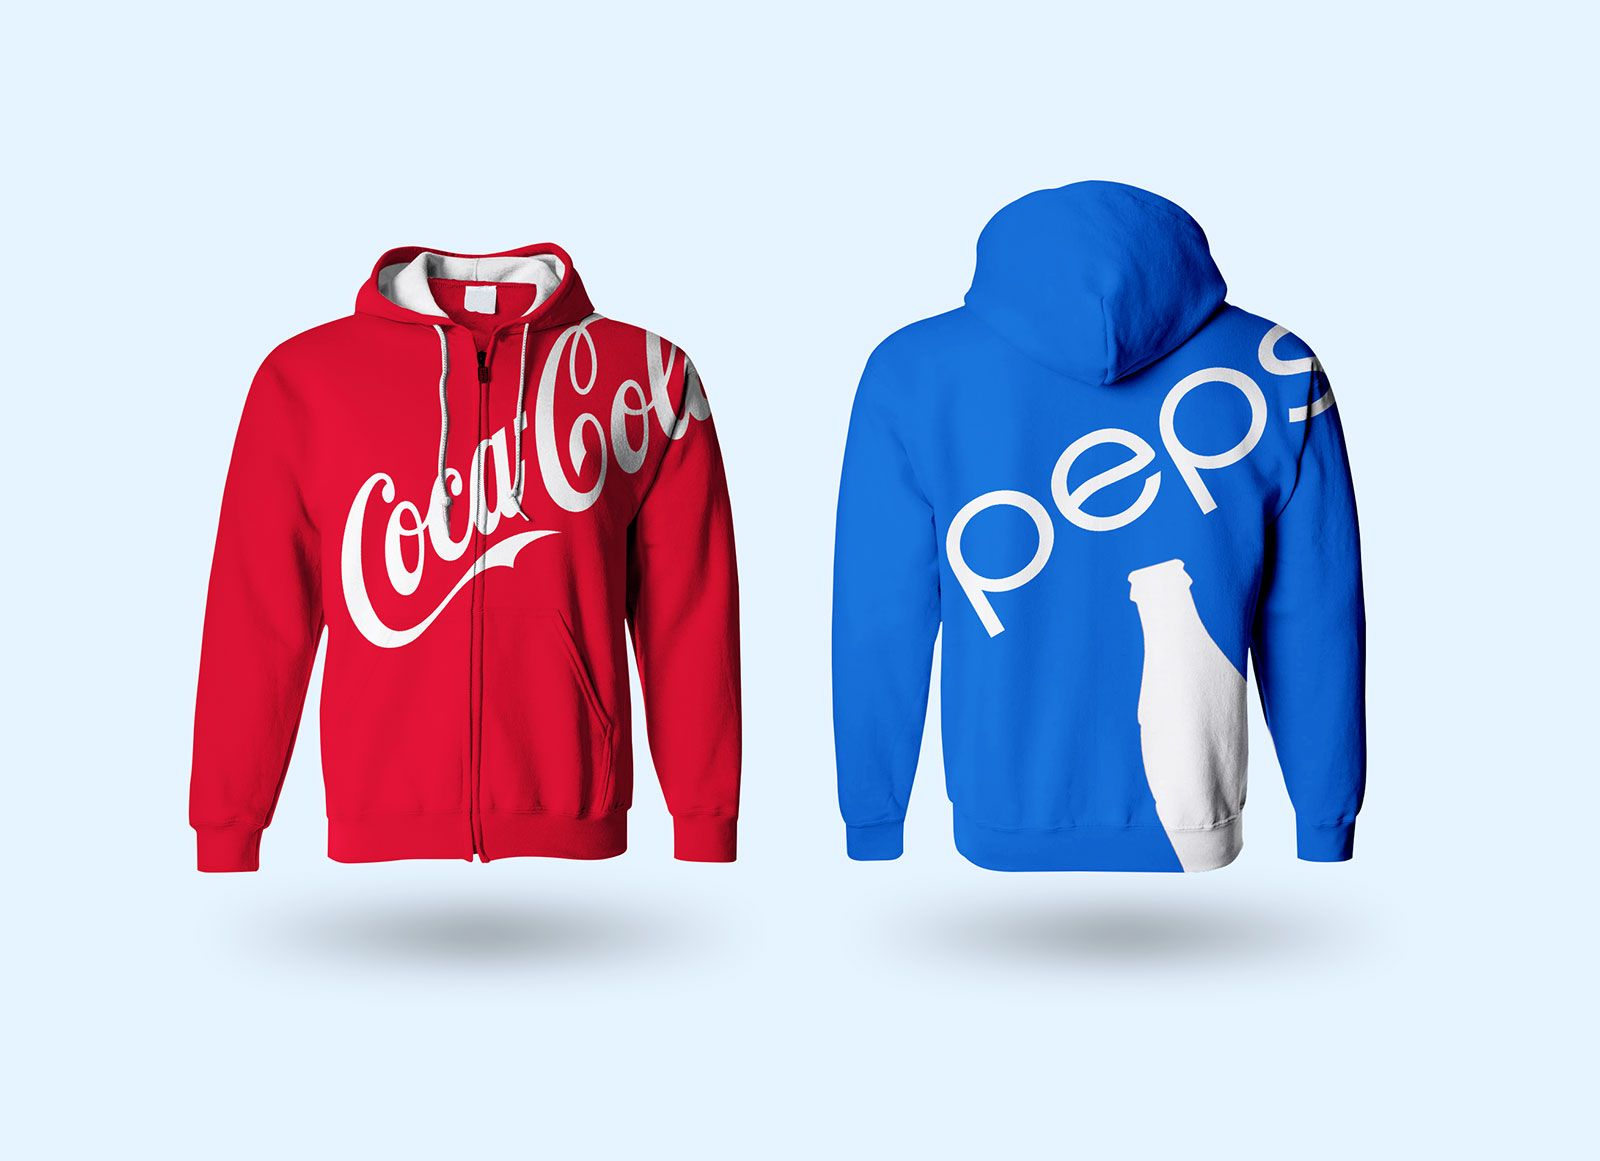 Download A High Quality Floating Front And Backside Presentation Of Men S Hoodie Sweatshirt Mockup With Several Customiz Mens Sweatshirts Hoodie Hoodies Men Sweatshirts